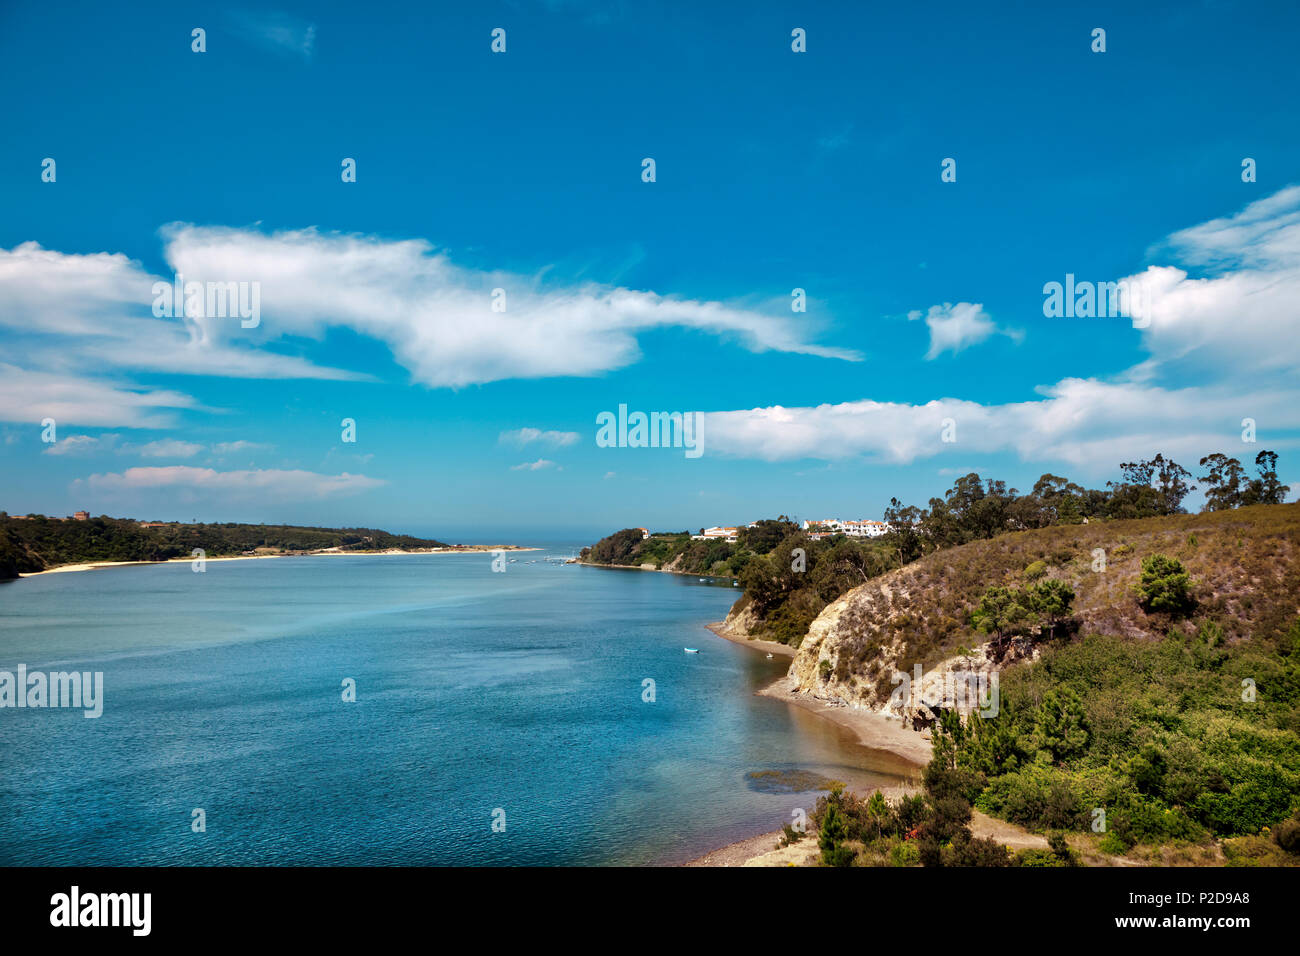 Bay, Vila Nova de Milfontes, Costa Vicentina, Alentejo, Portugal Photo Stock